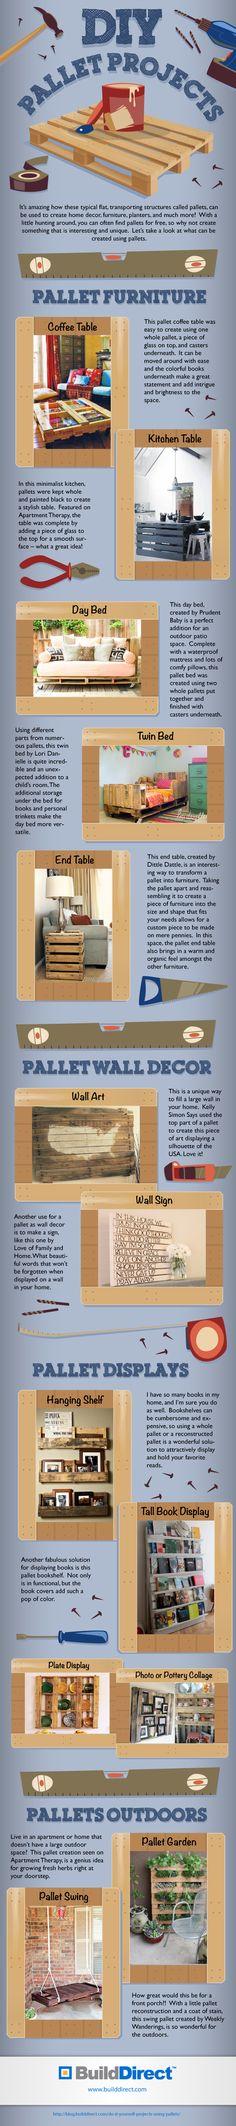 DIY Pallets4 DIY Pallet Projects